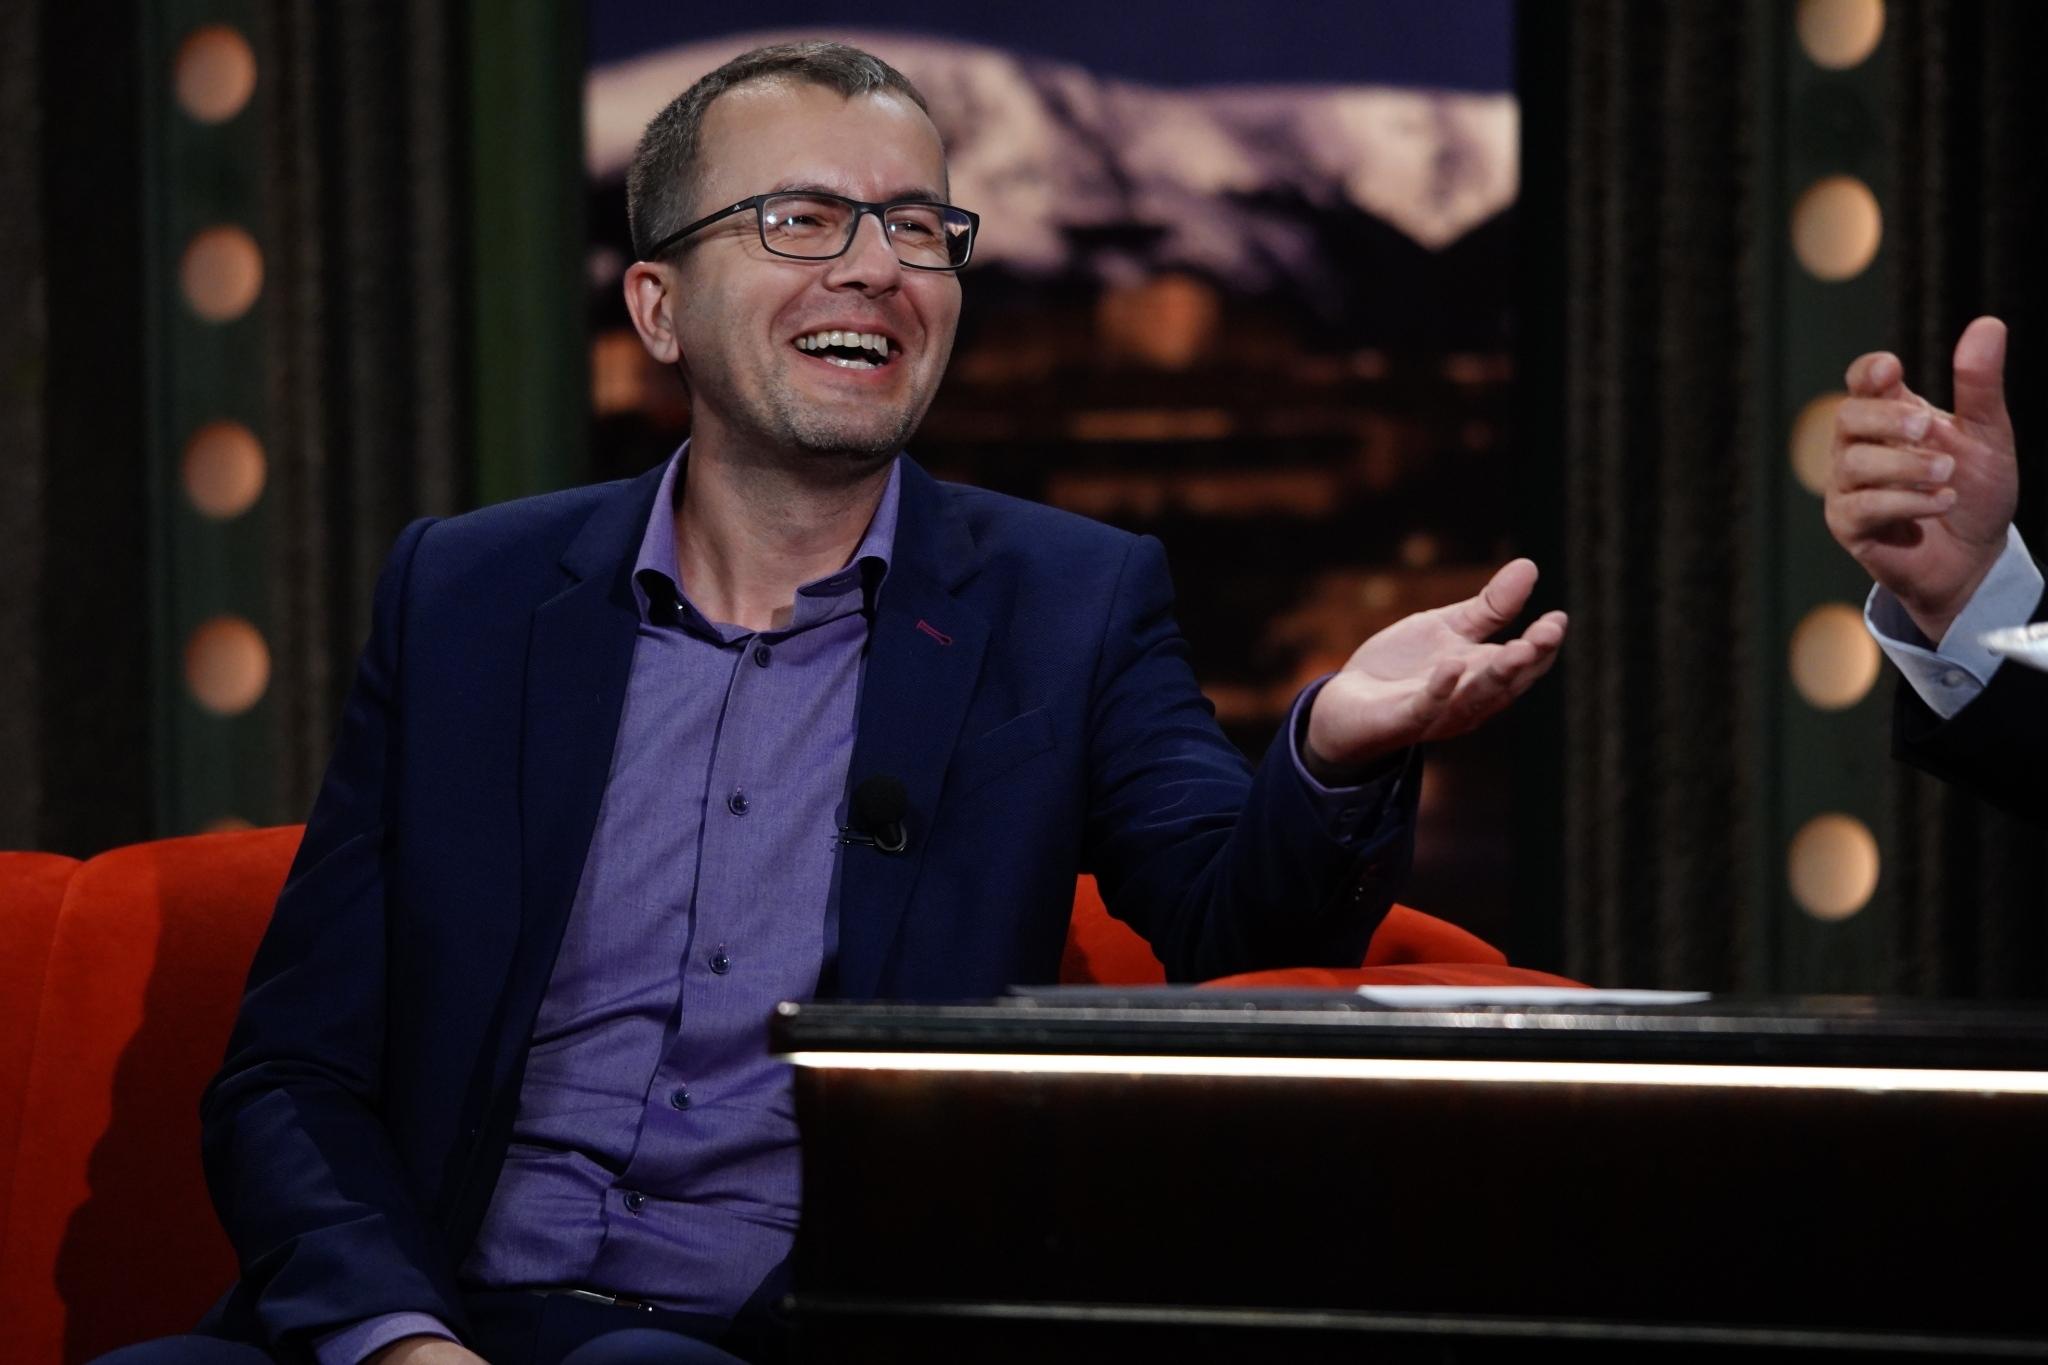 Molekulární biolog Petr Ryšávka v SJK 16. 9. 2020